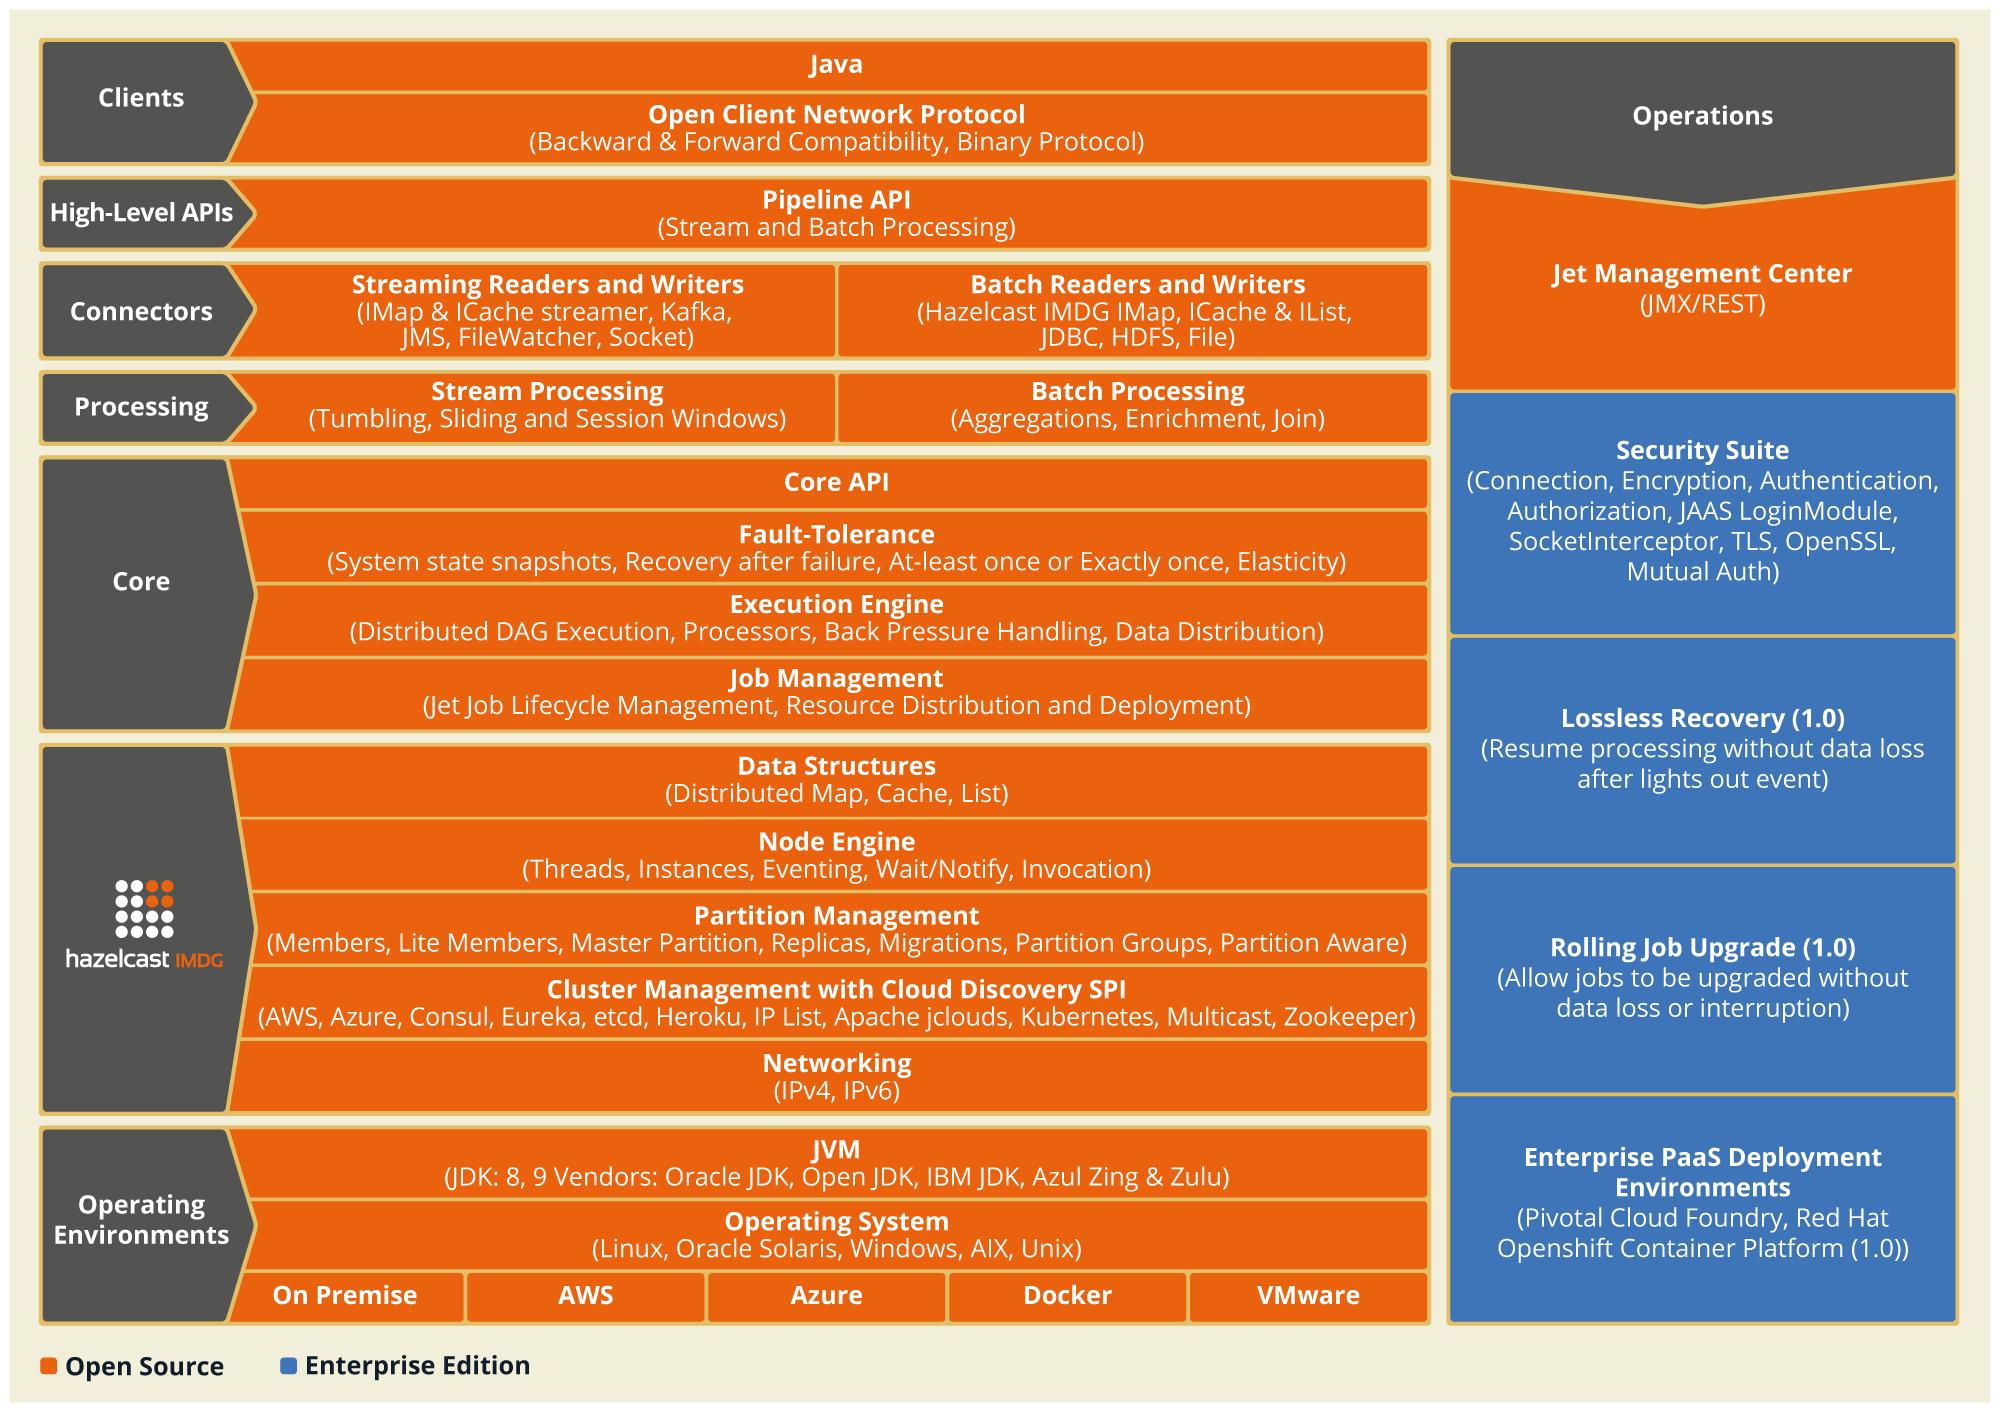 WINPOLICY BAIXAR PROGRAMA